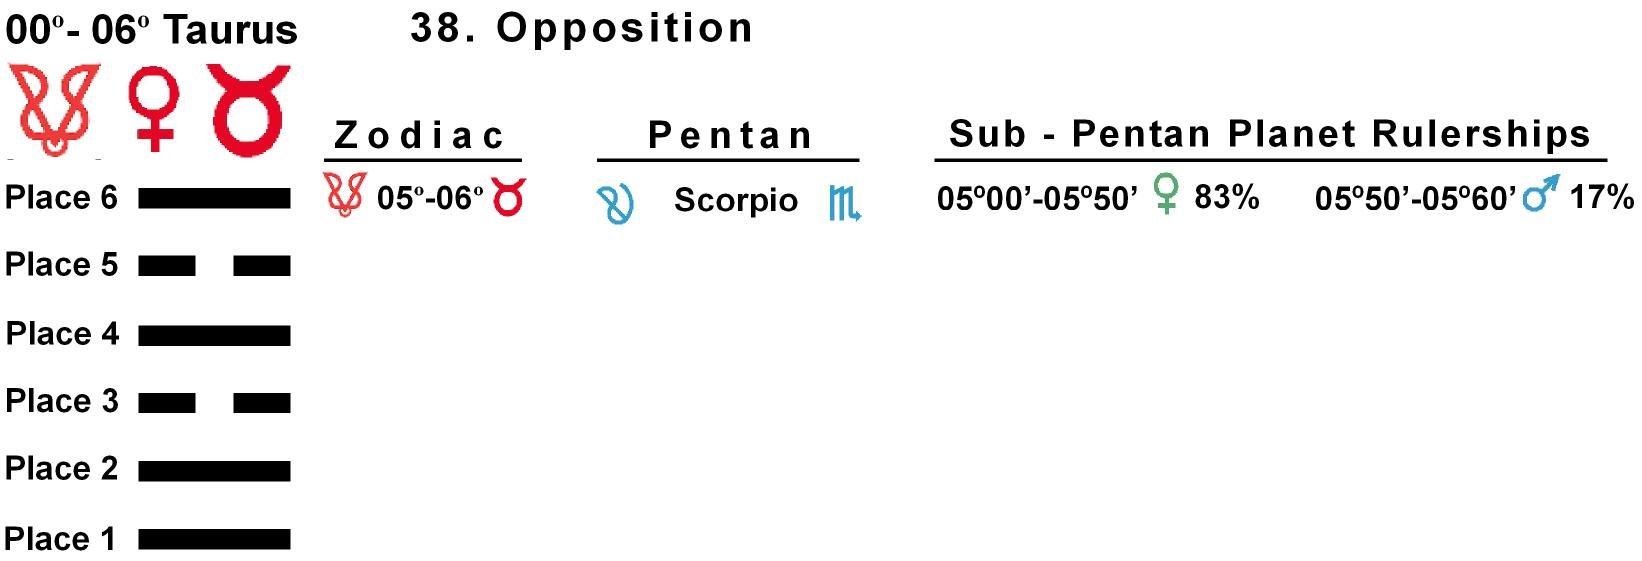 Pent-lines-02TA 05-06 Hx-38 Opposition